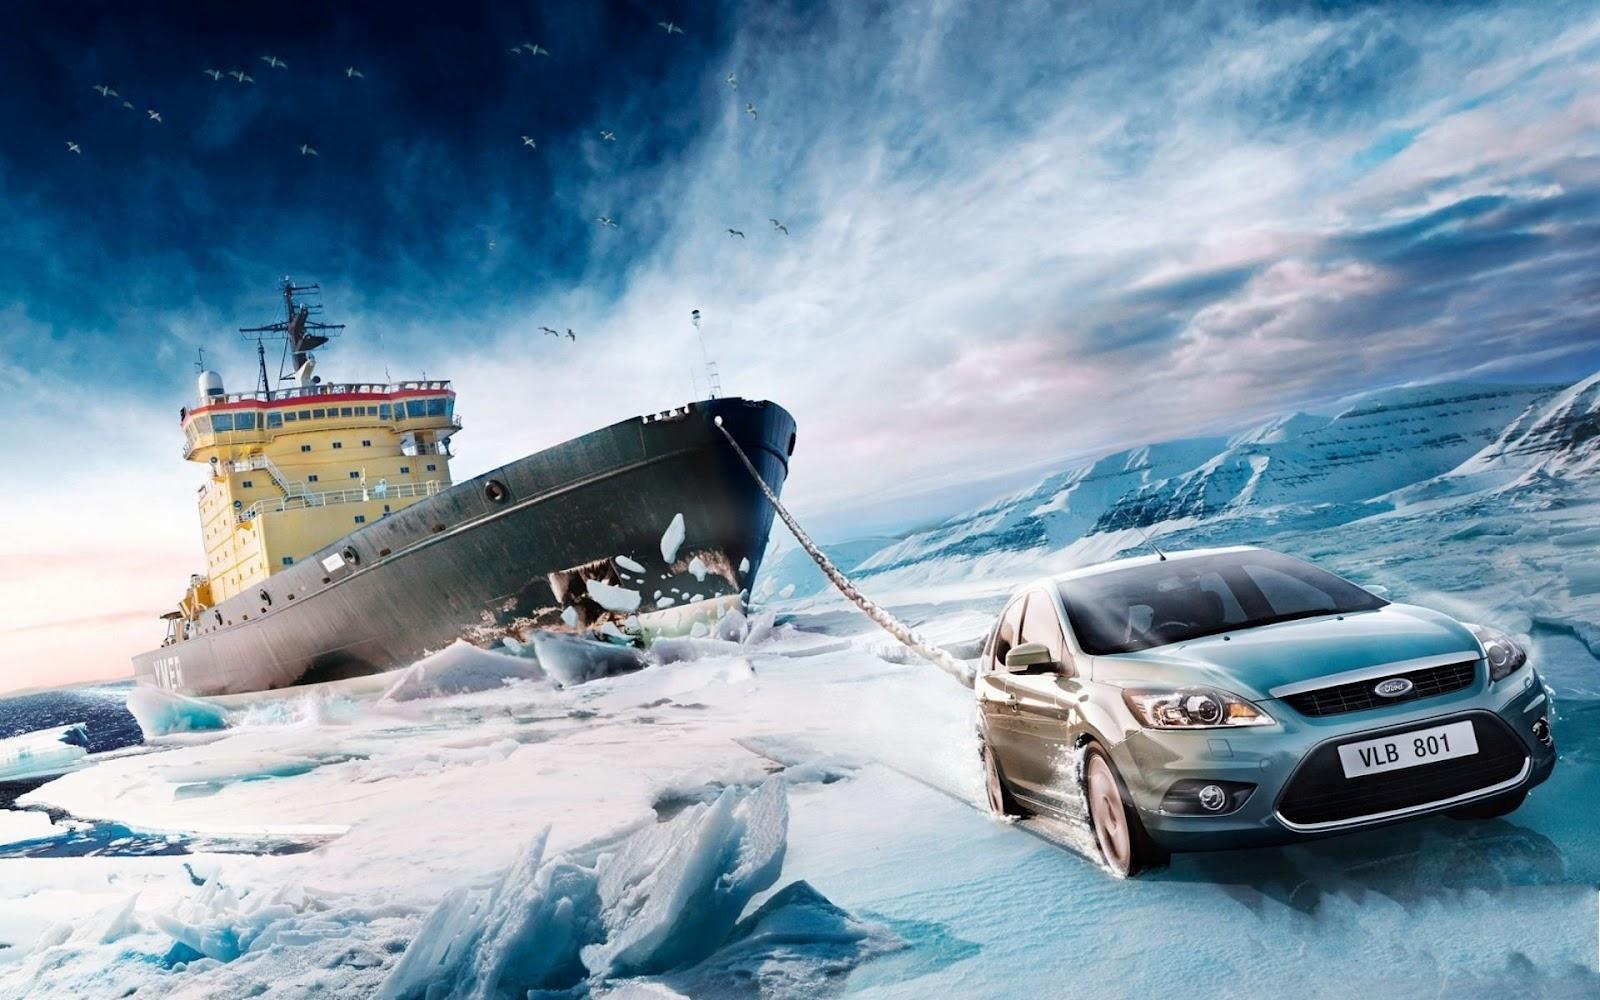 Top Hd Wallpapers Cars Wallpapers Desktop Hd: TOP HD WALLPAPERS: CARS WALLPAPERS DESKTOP HD